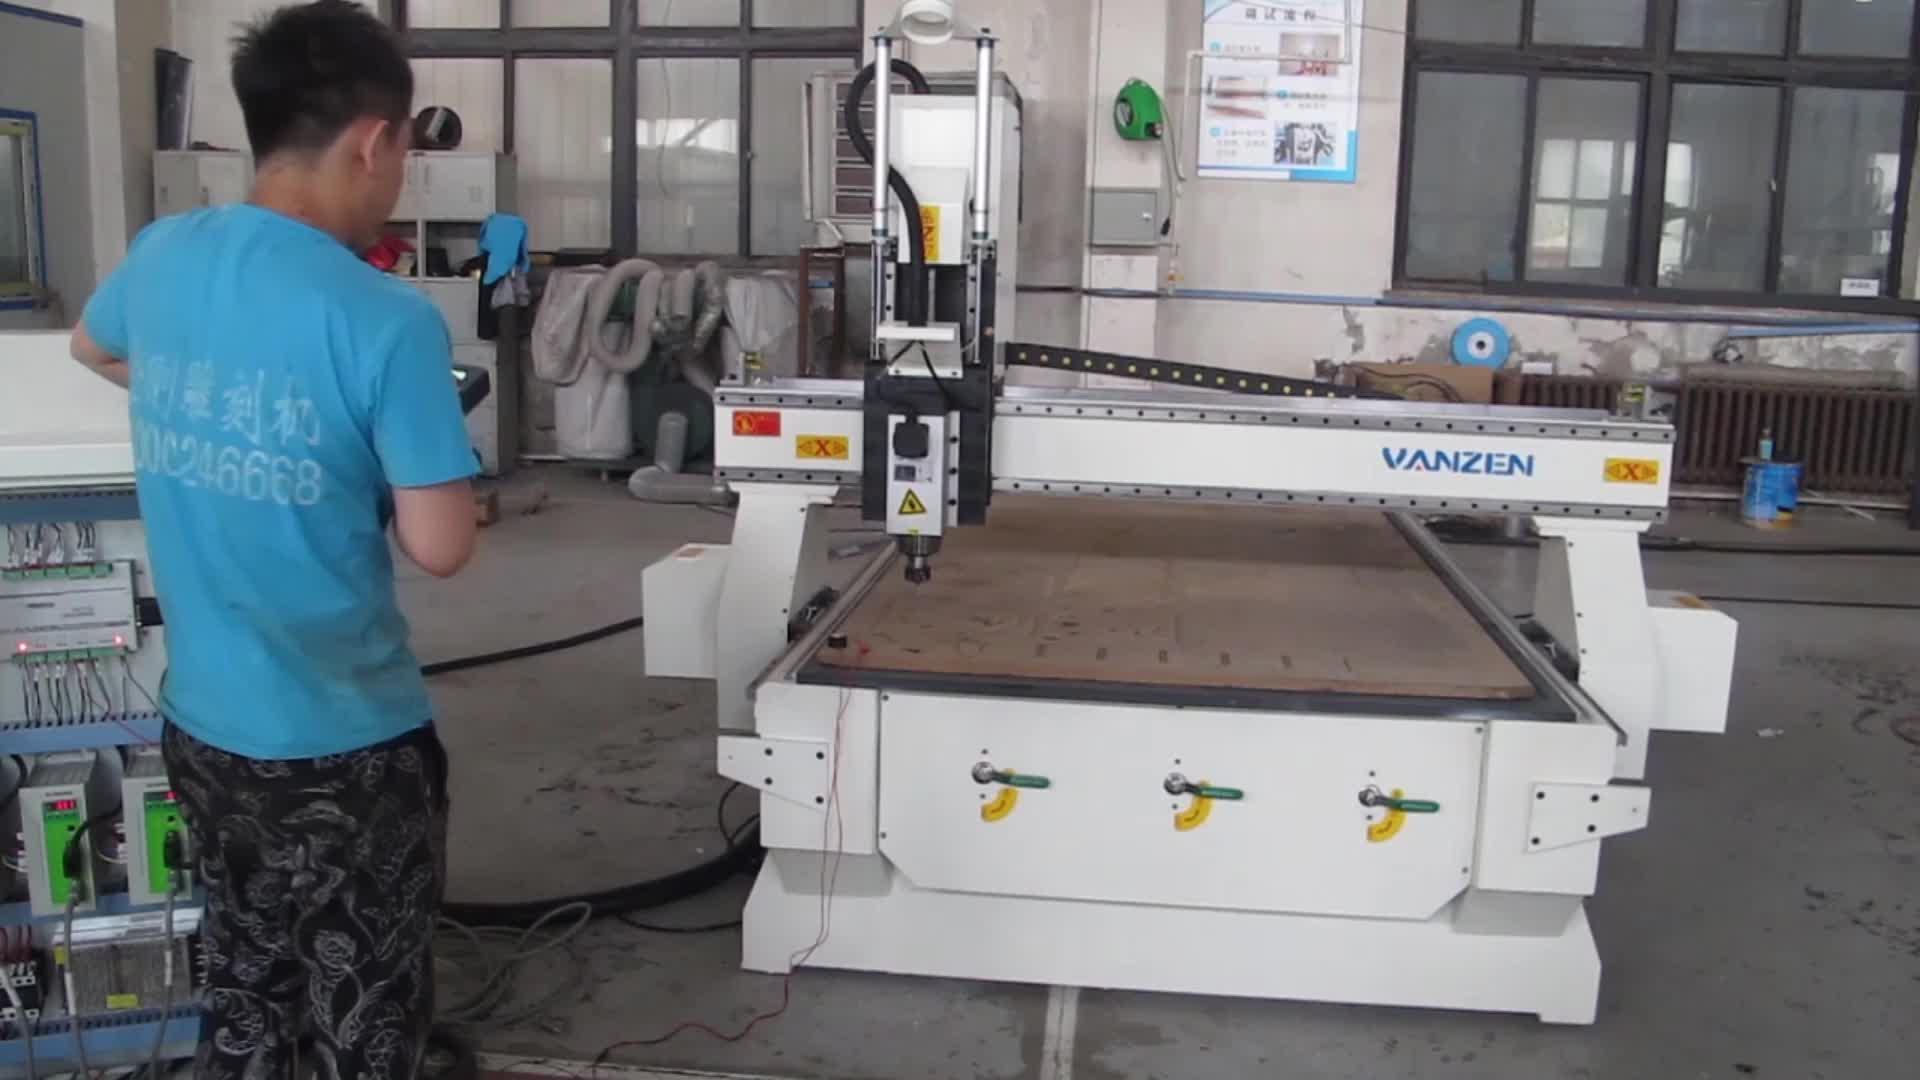 सबसे अच्छी कीमत 1325 लकड़ी सीएनसी रूटर फर्नीचर बनाने की मशीन मूल्य सूची